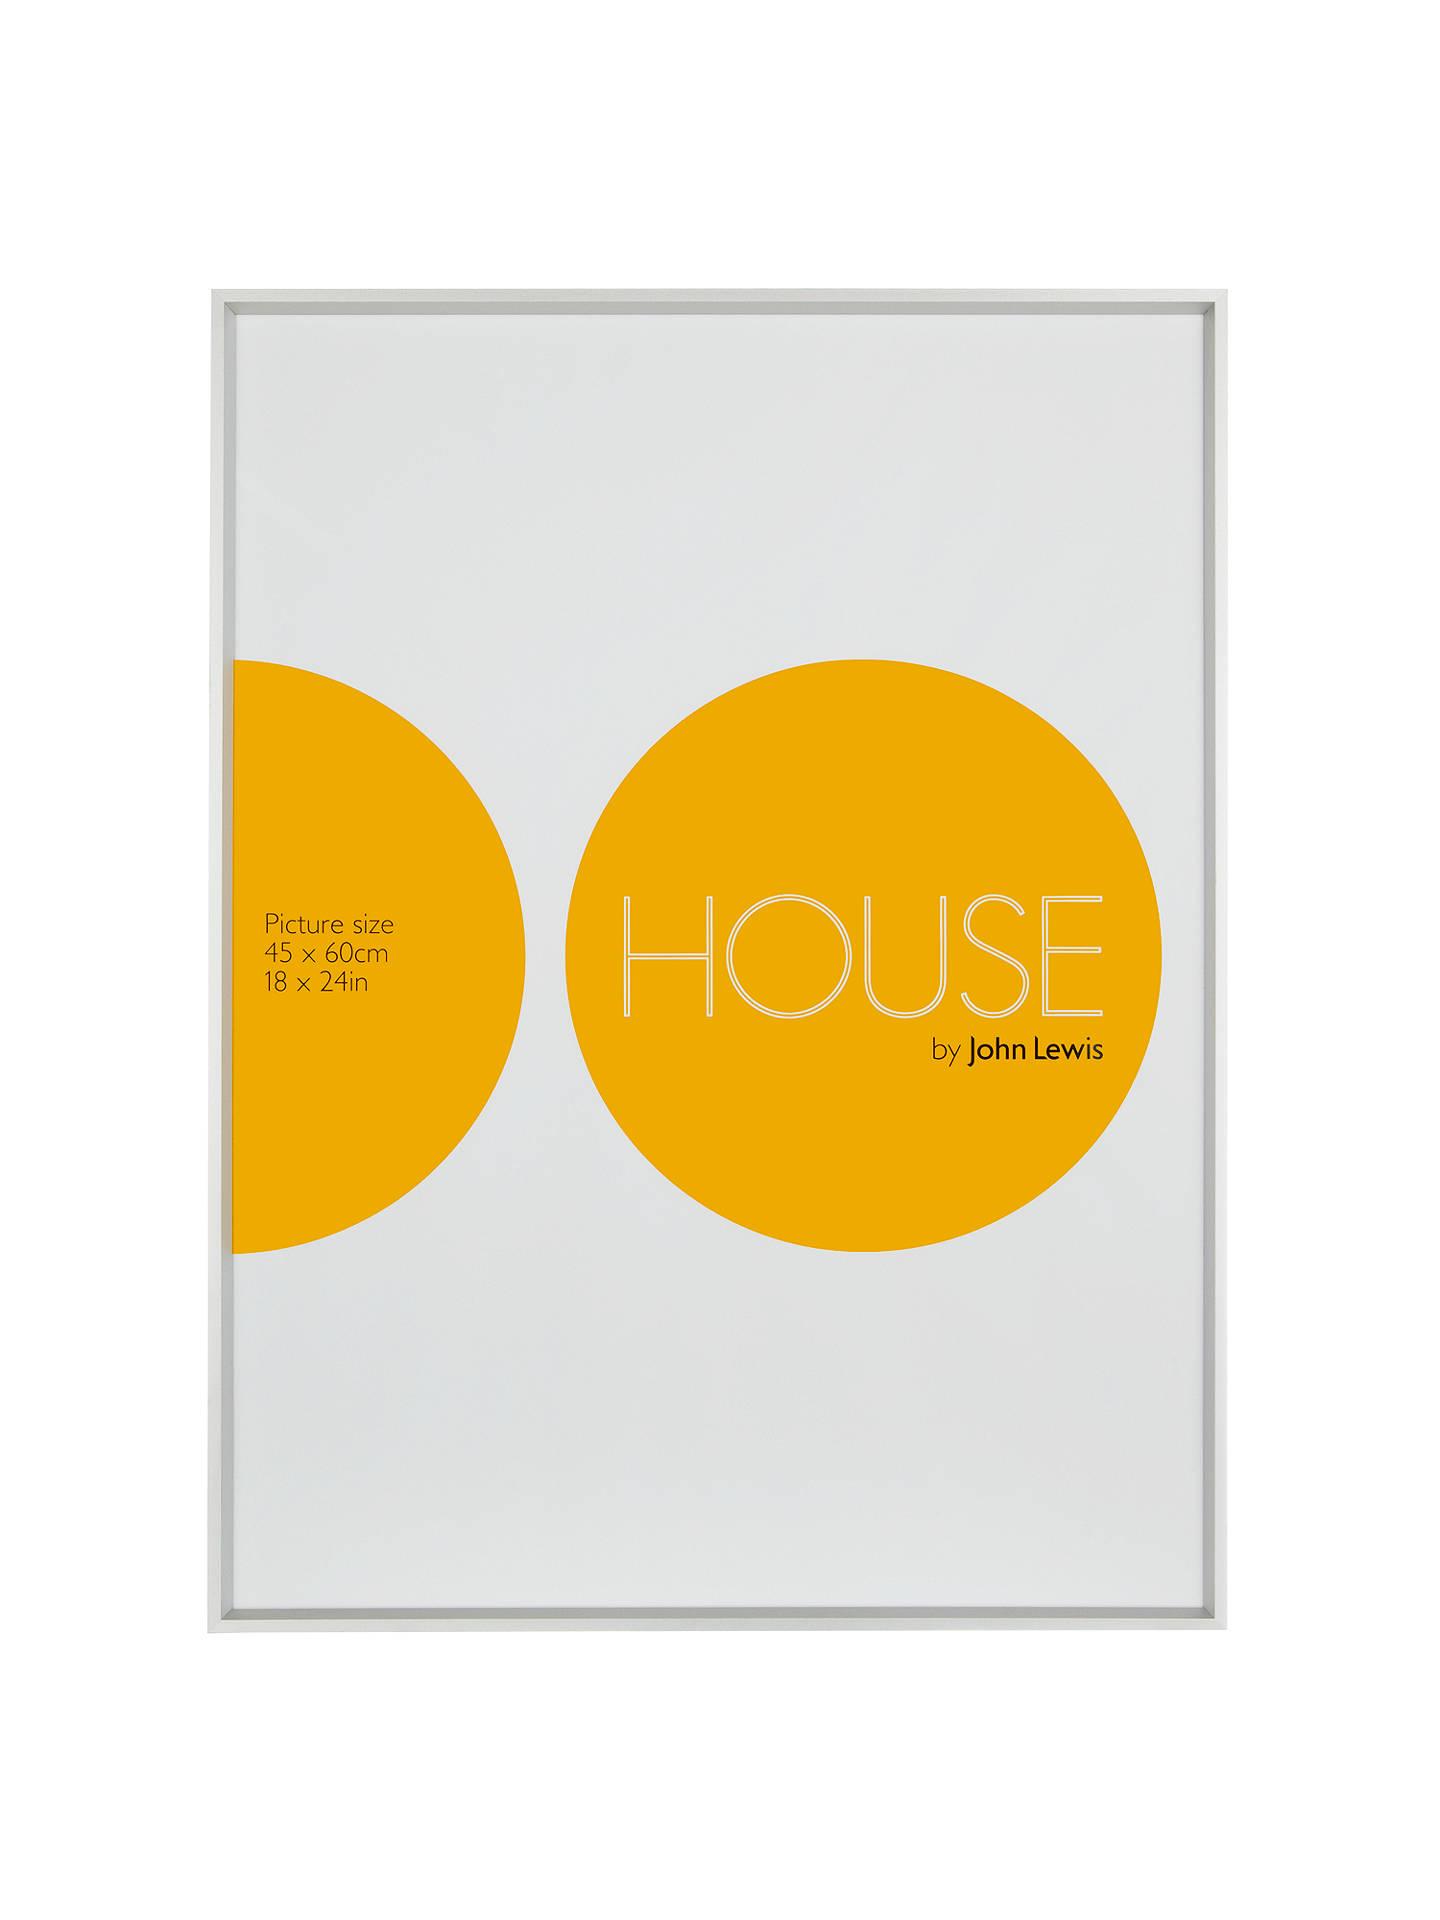 House By John Lewis Aluminium Photo Frame 18 X 24 45 X 60cm